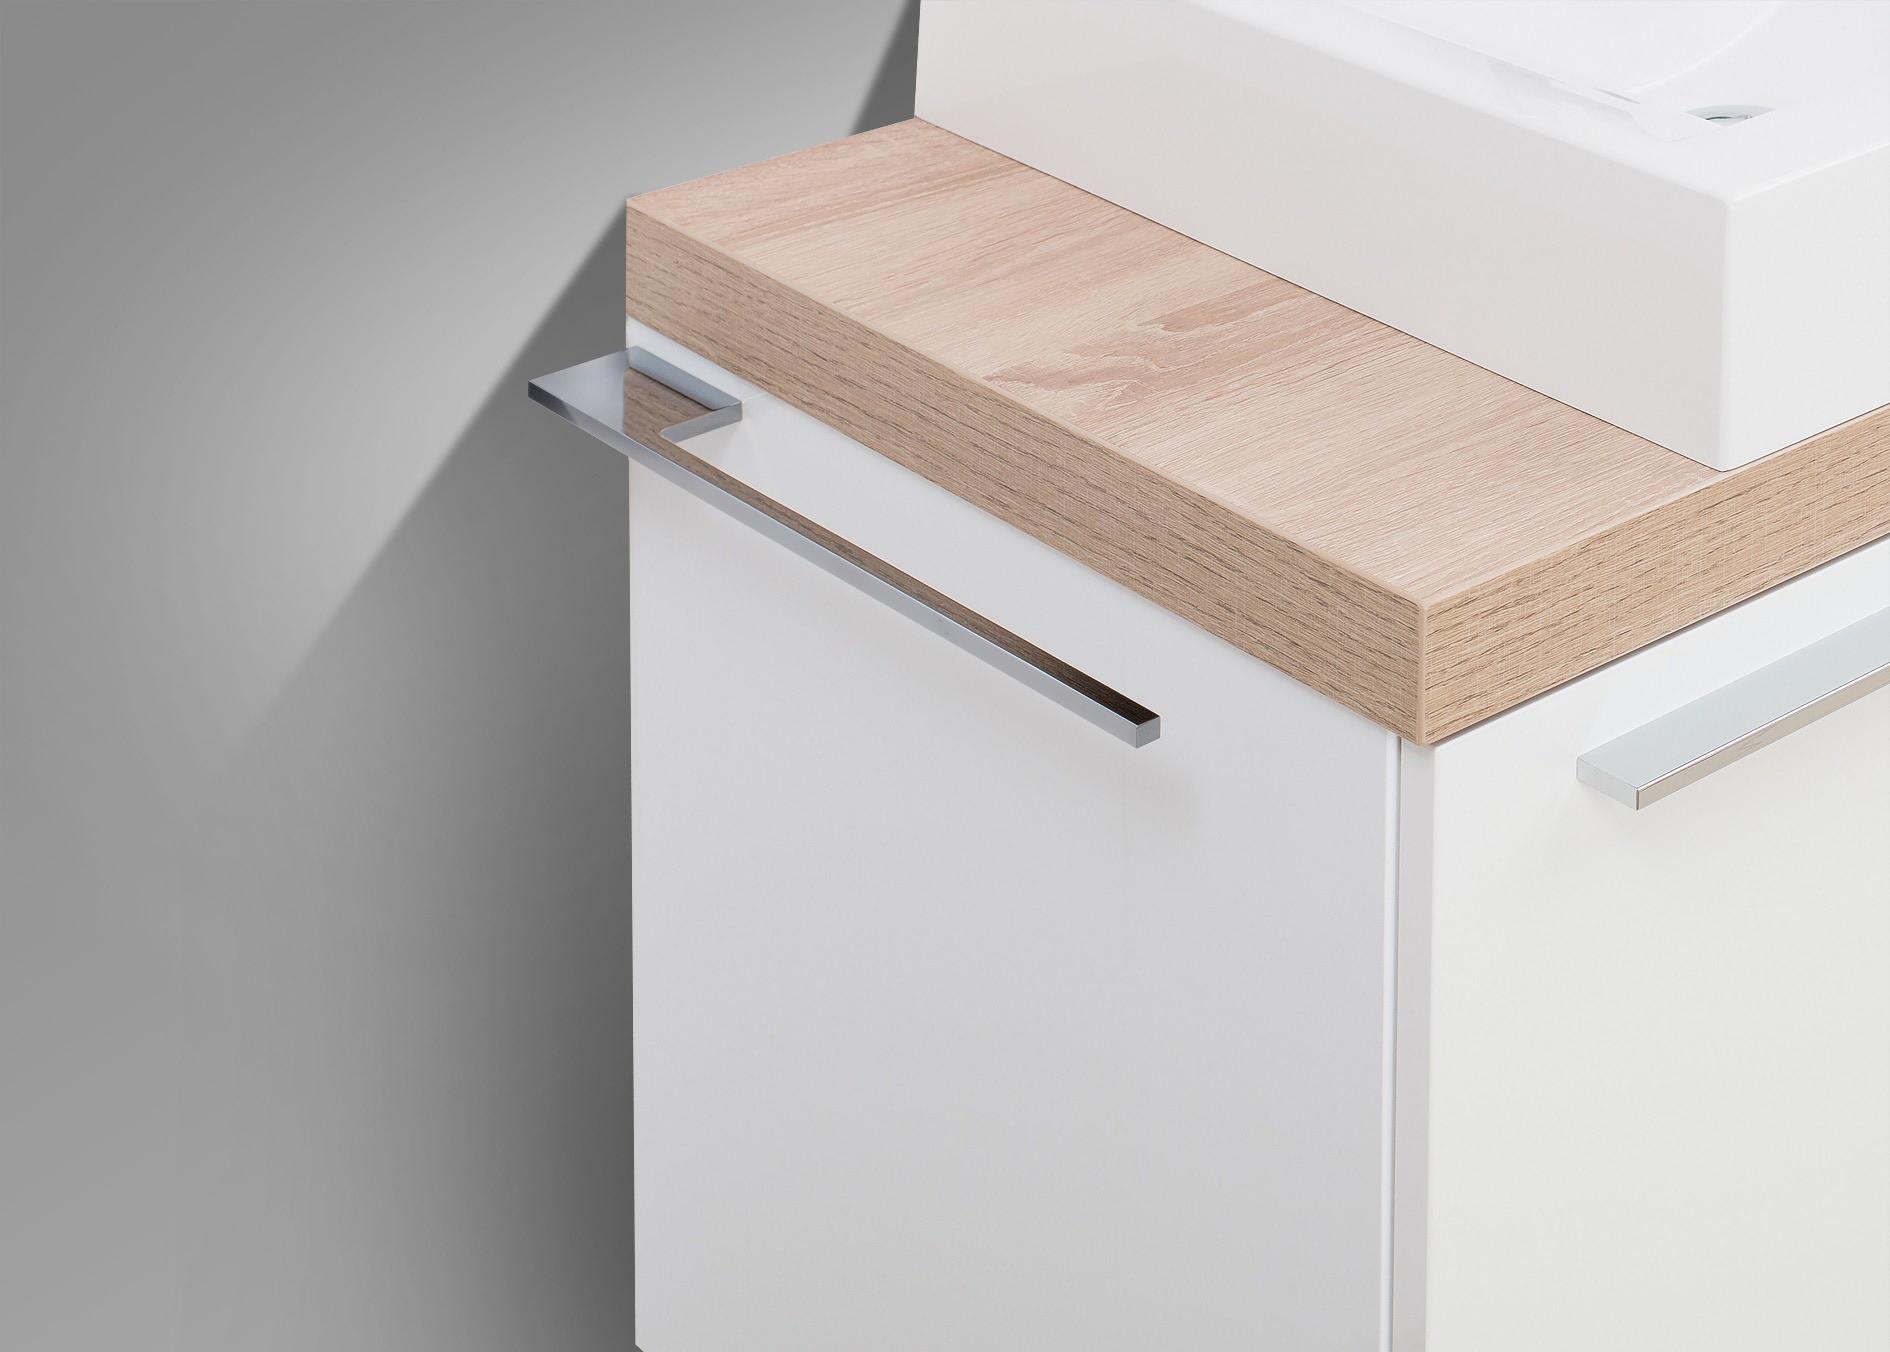 Handtuchhalter Bad Chrom bad accessoires Design Badetuchstange ...